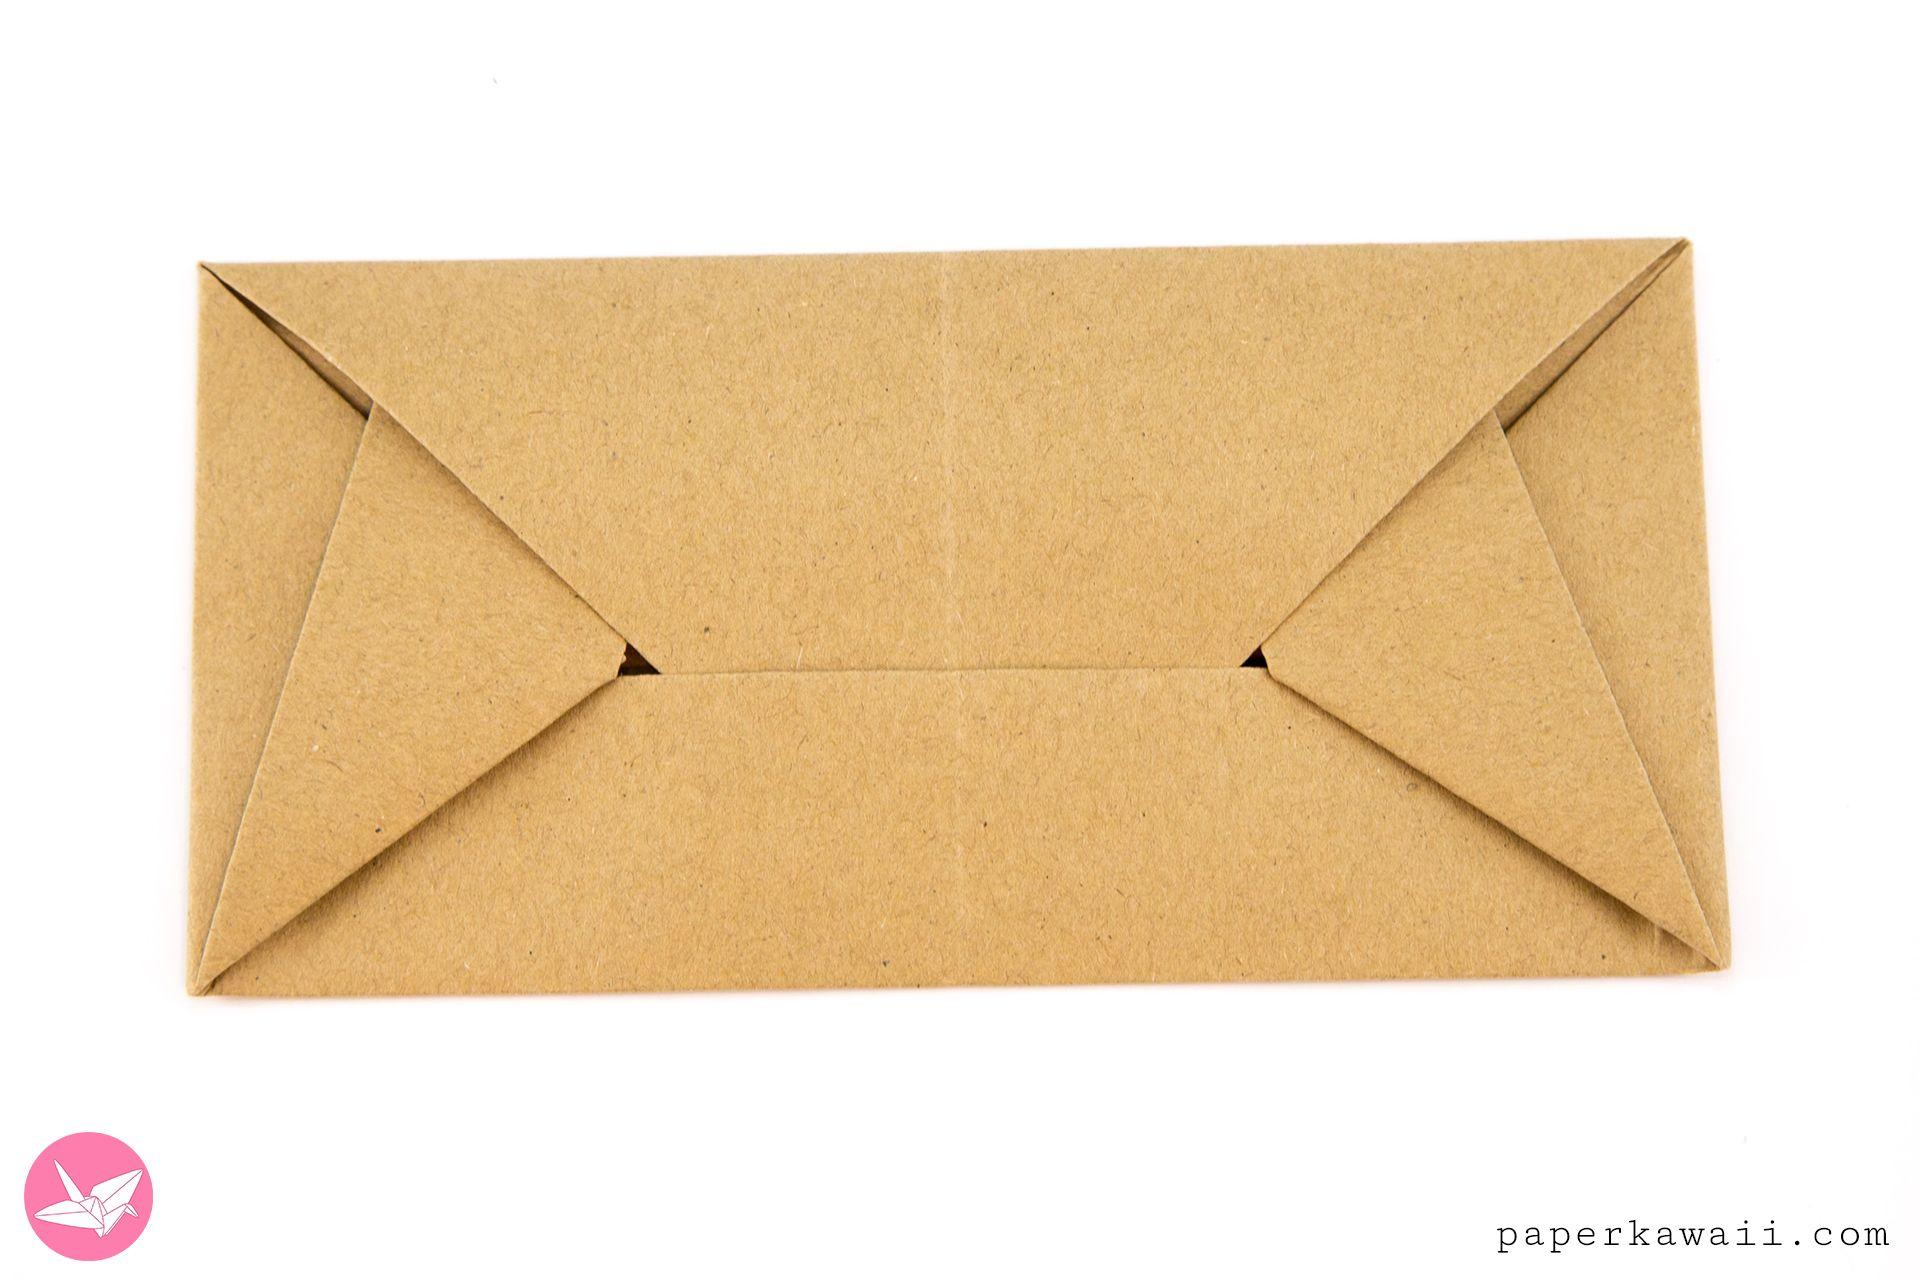 Envelope Origami Easy Easy Origami Envelope Letterfold Simon Andersen Crafts